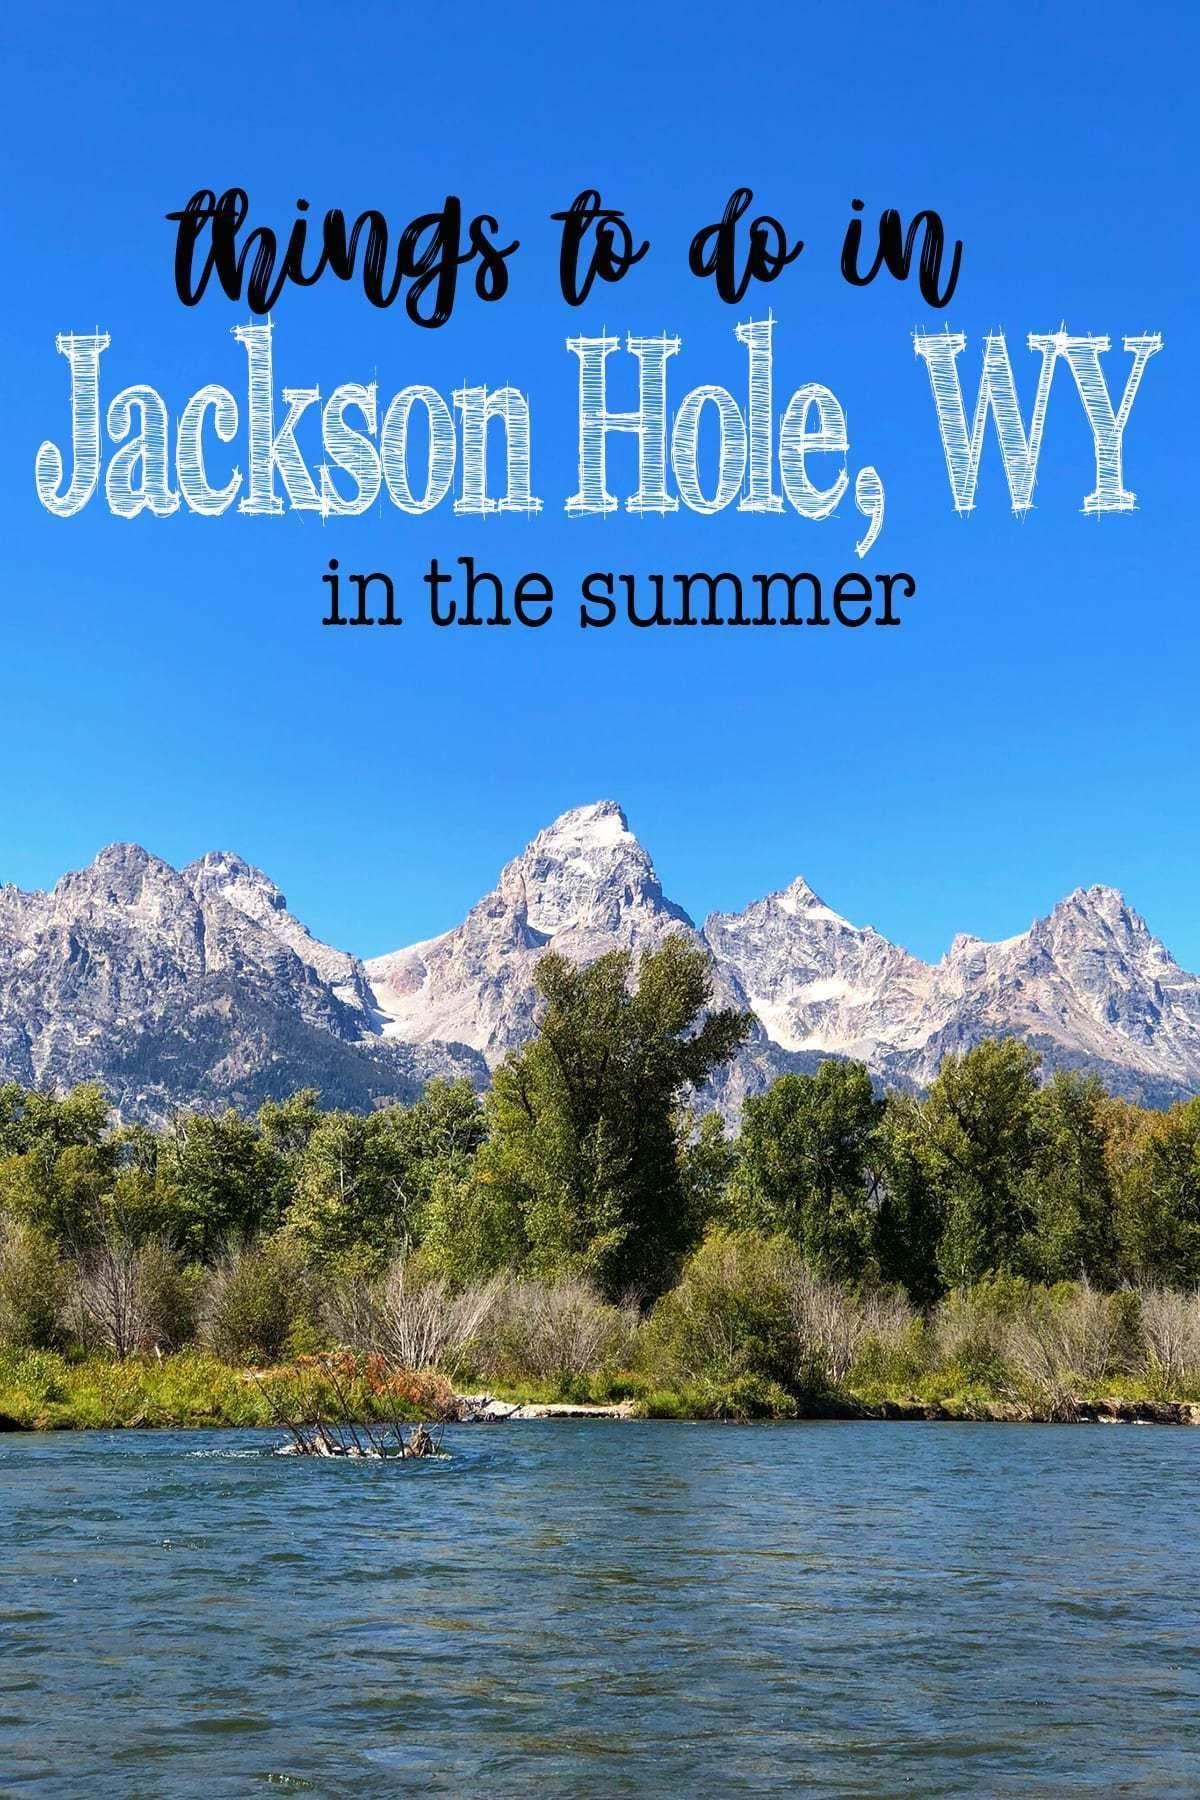 054254160e77b5dbb7f006b4603f7c02 - How Long Does It Take To Get To Wyoming